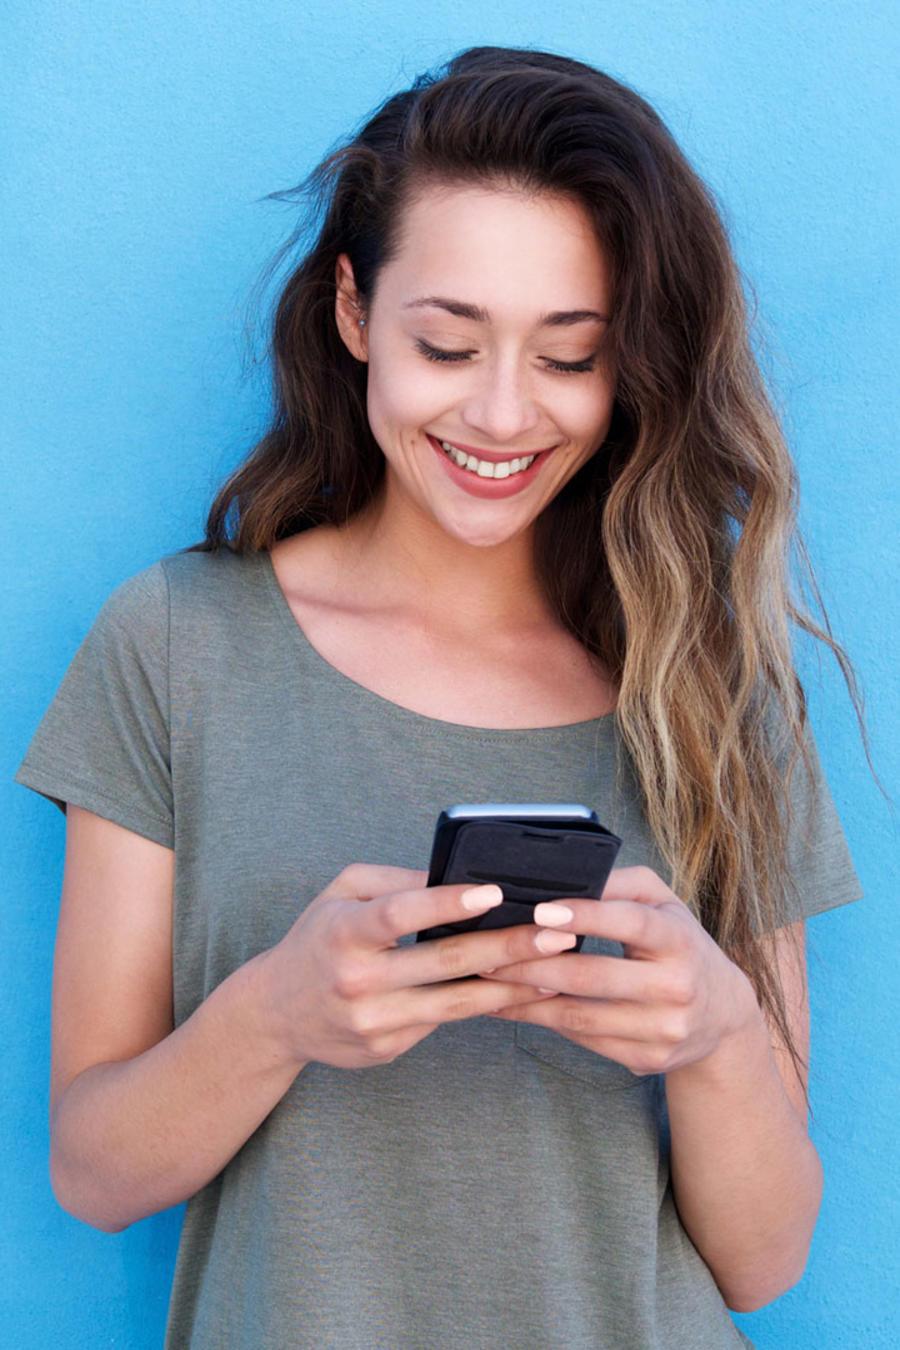 Chica sonriente con teléfono móvil